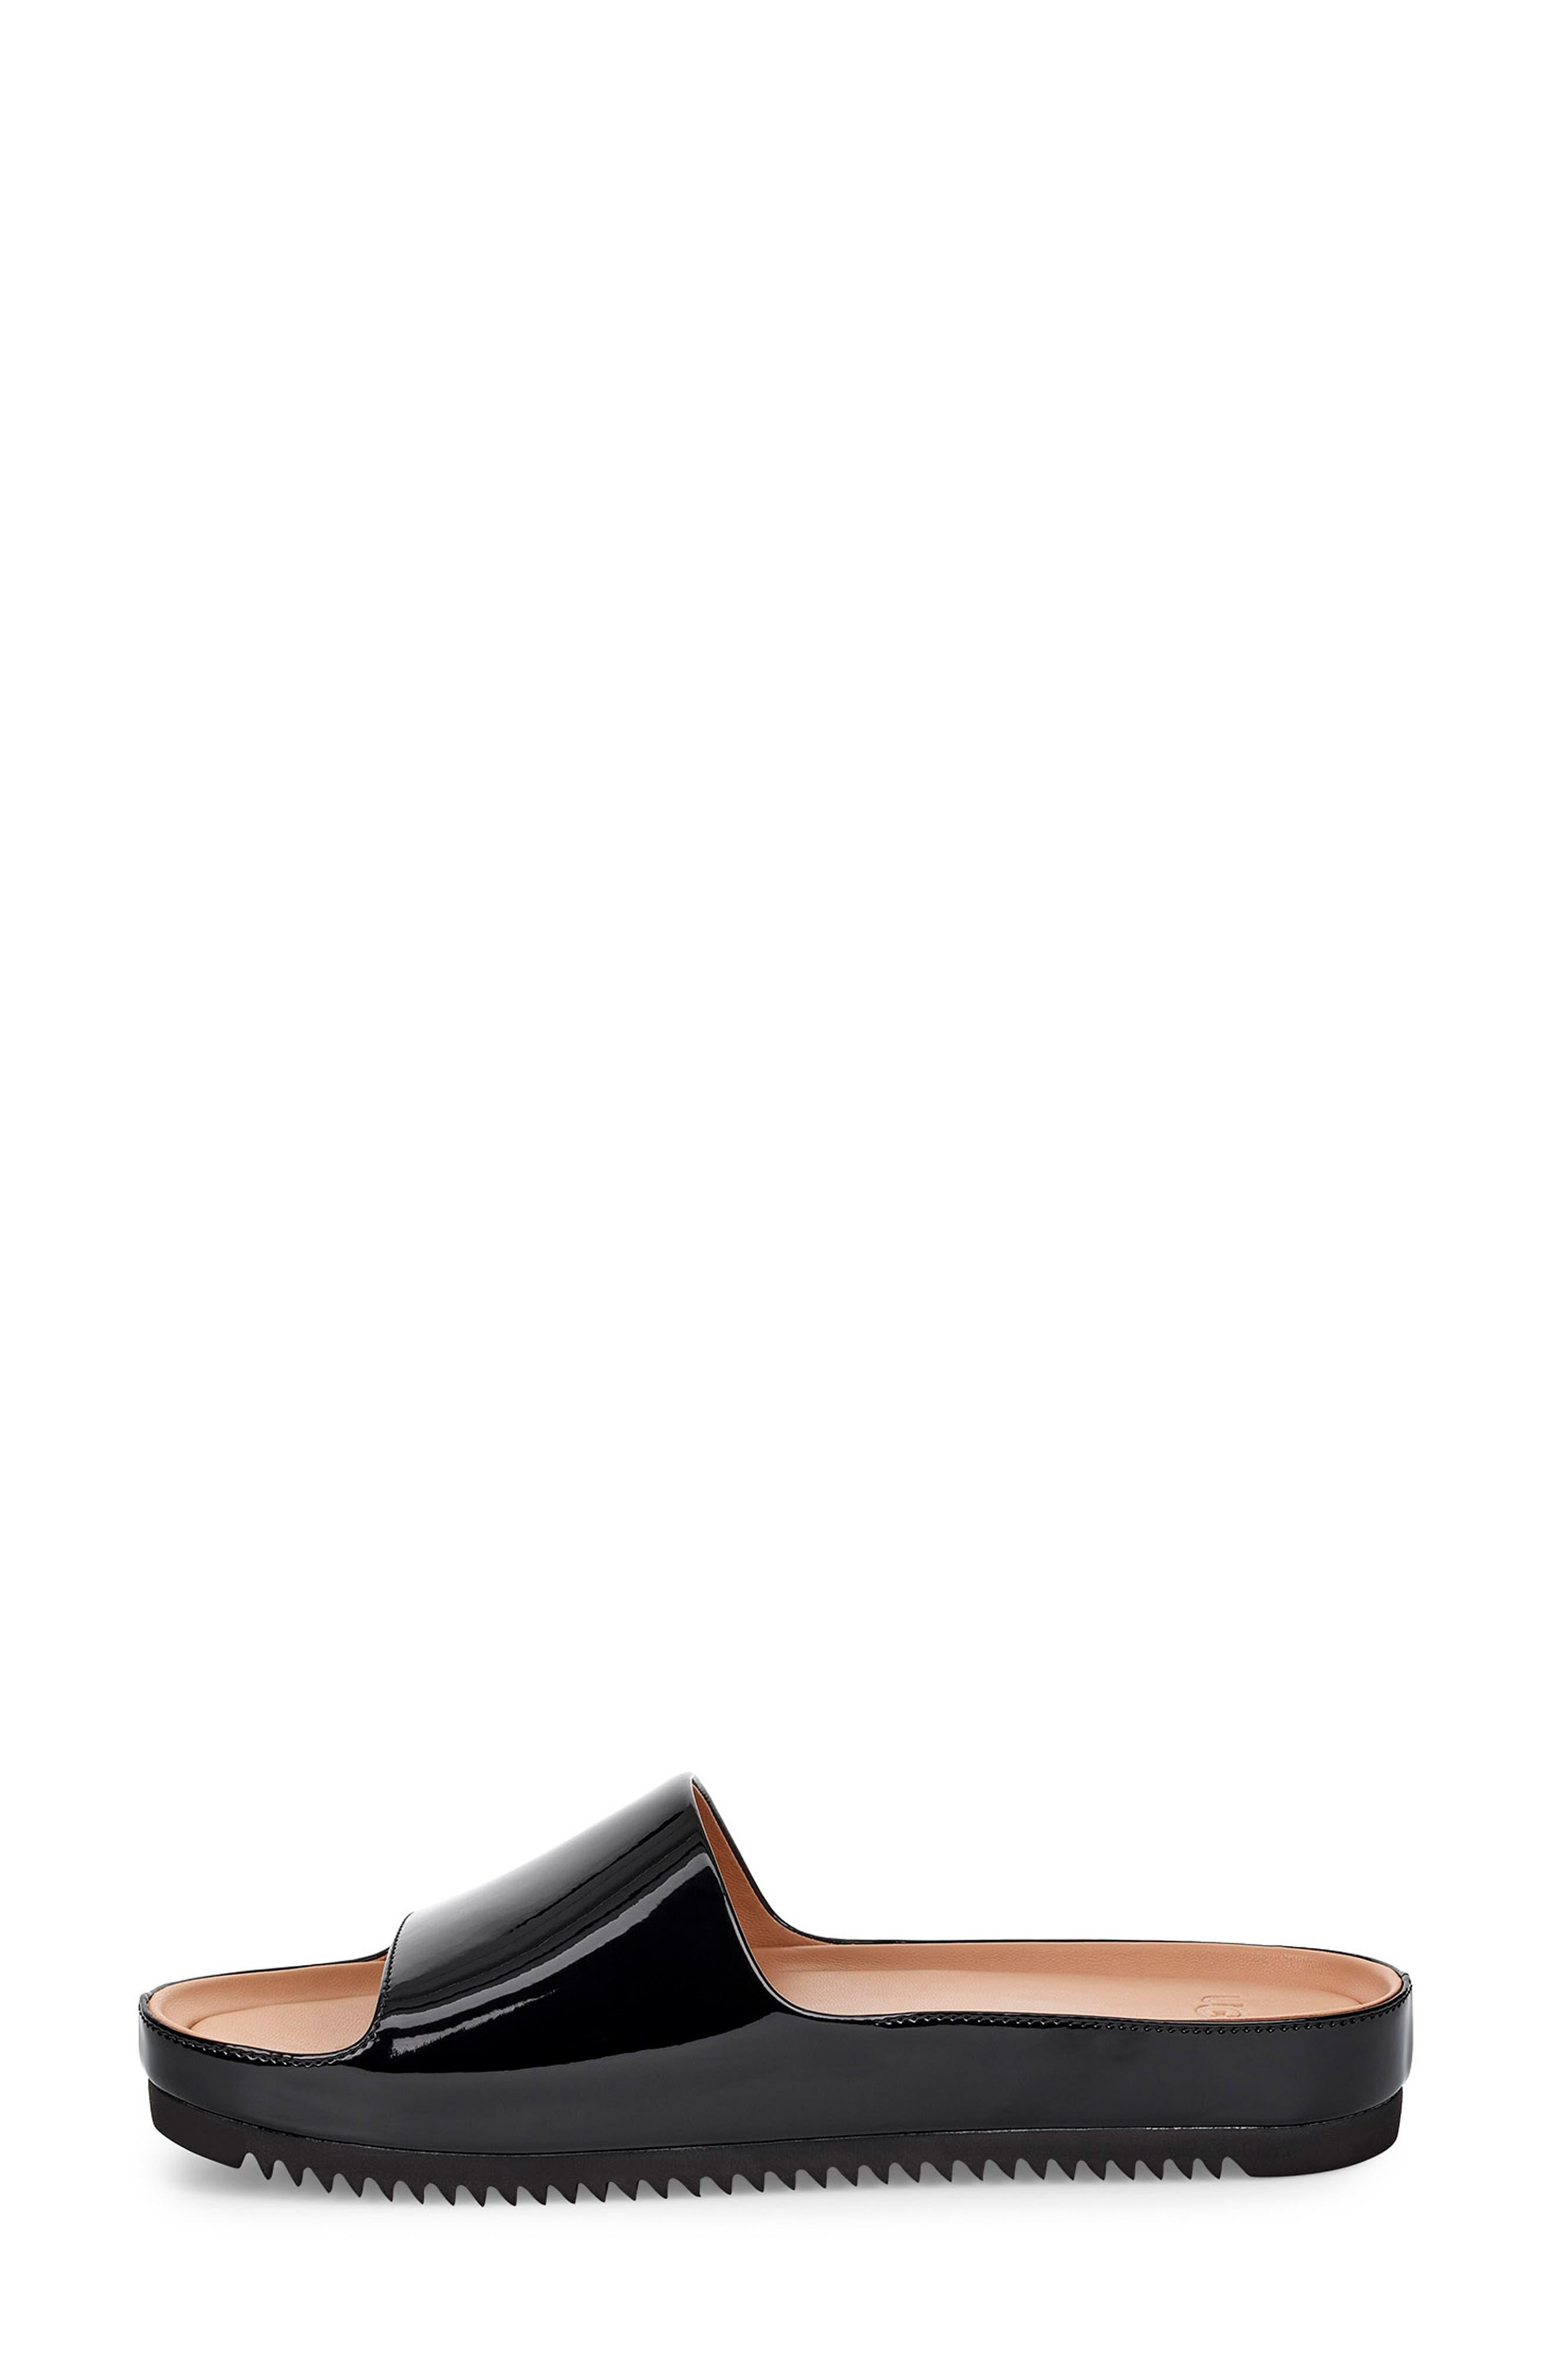 Jane Platform Slide Sandal,                             Alternate thumbnail 6, color,                             BLACK PATENT LEATHER